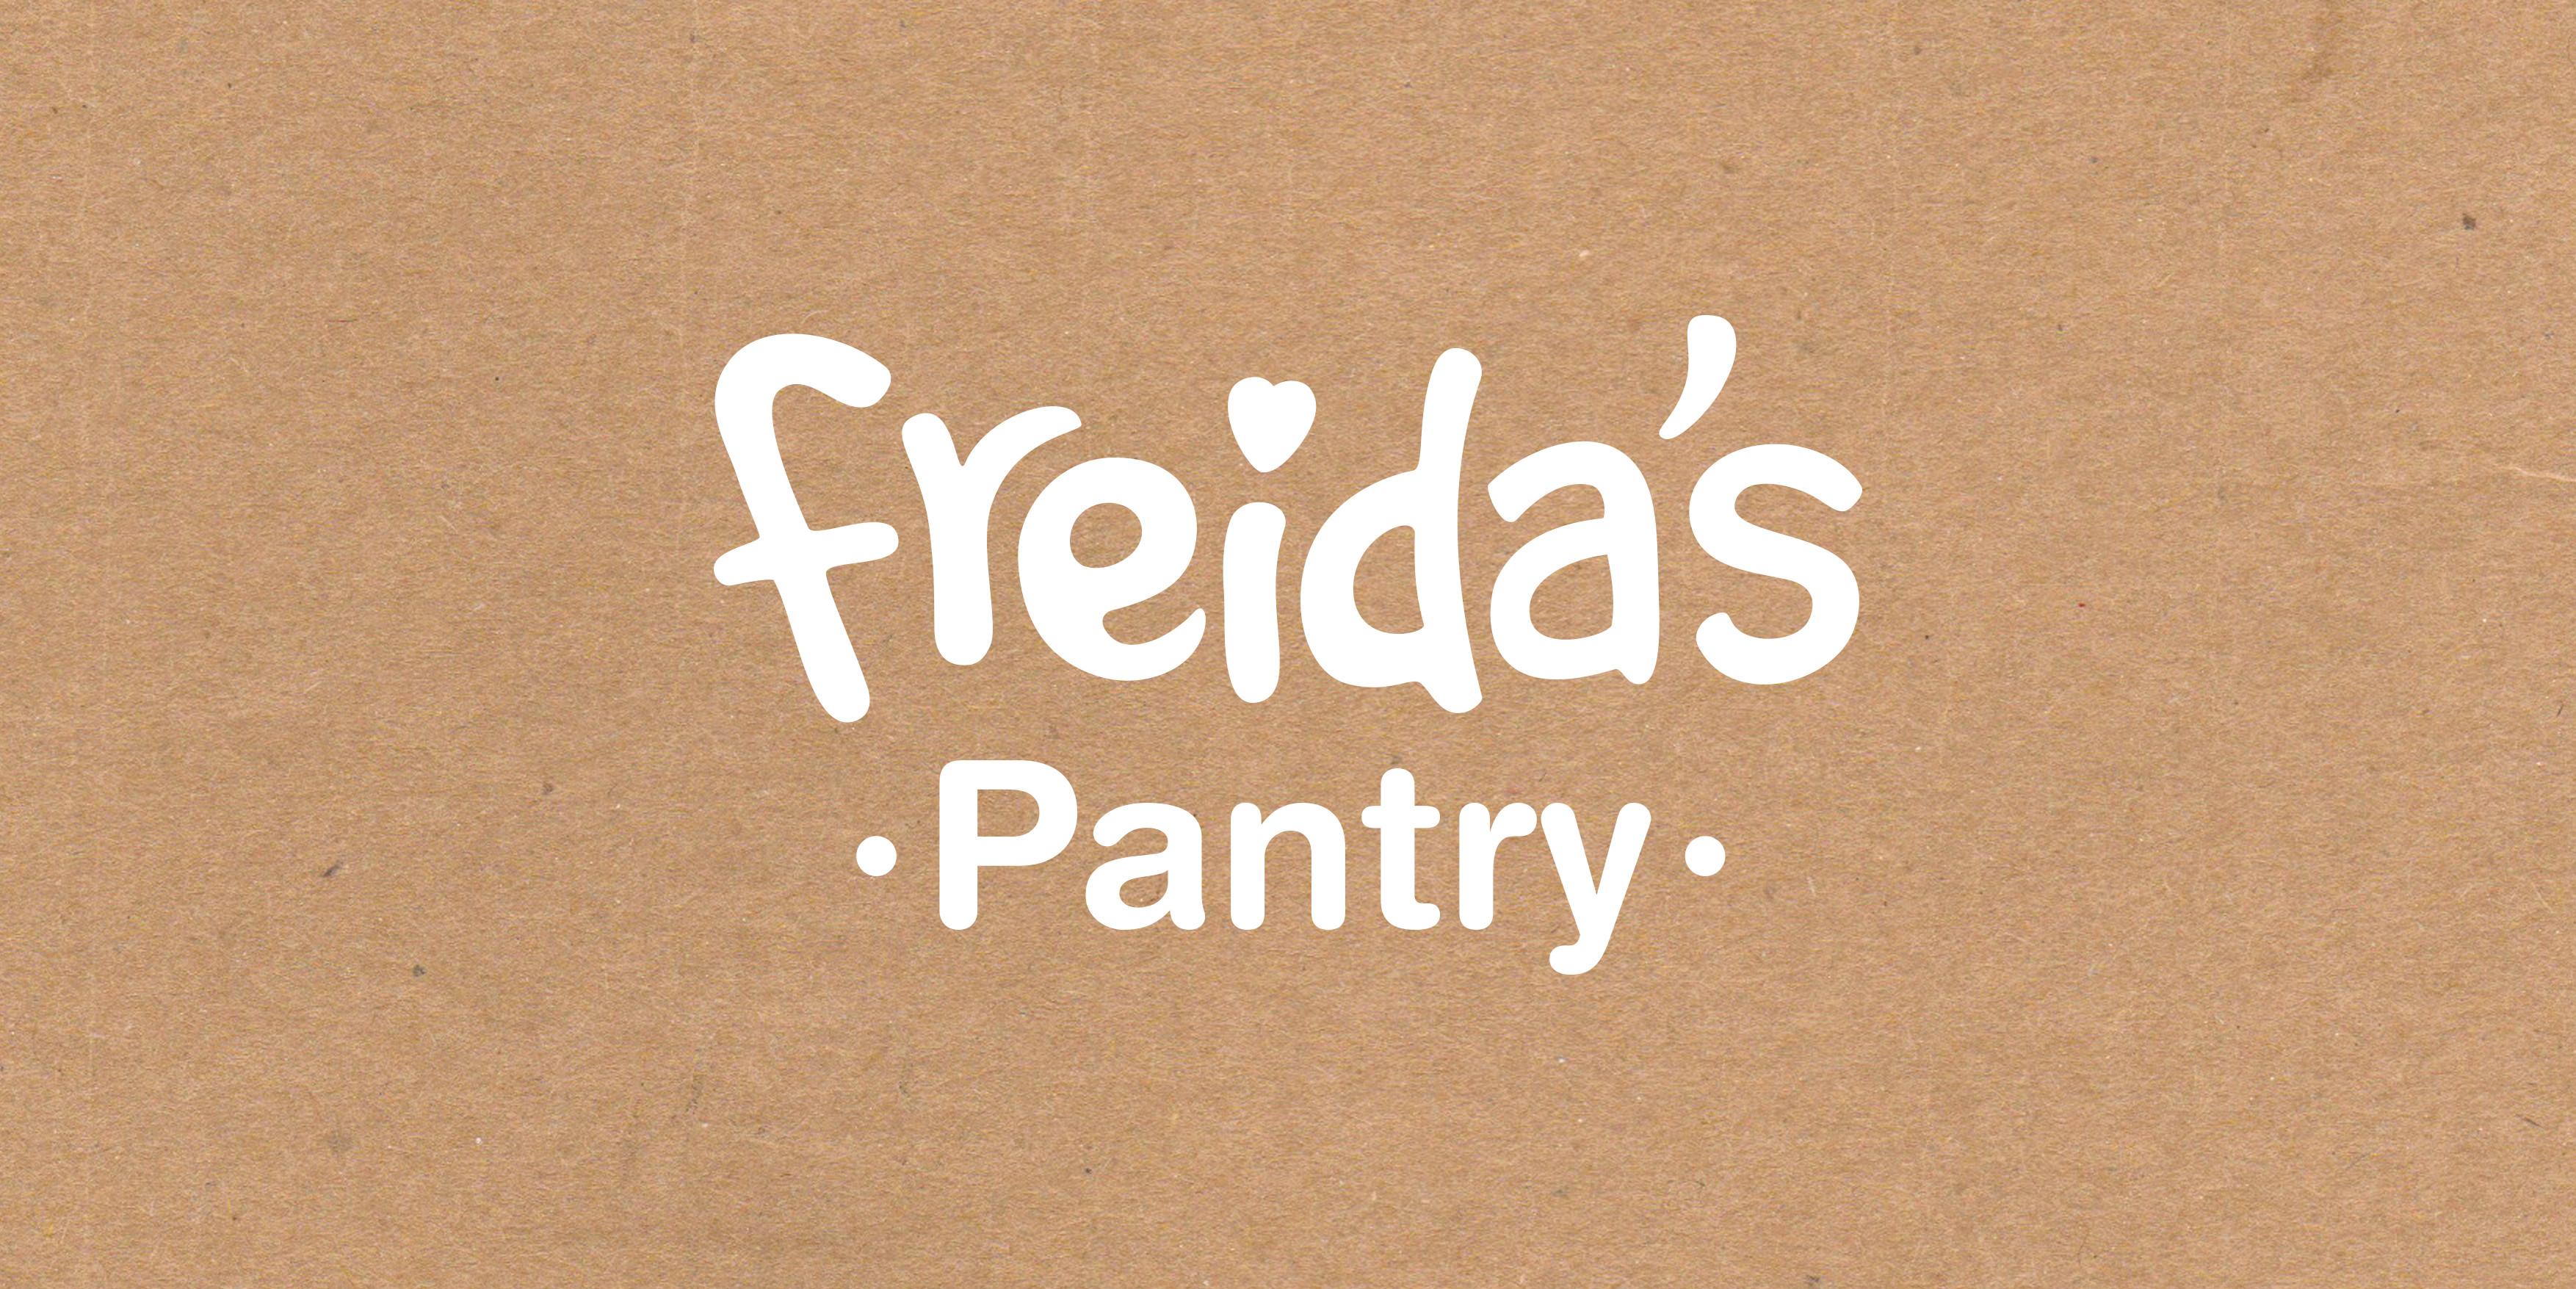 Freida's Pantry Logo Design